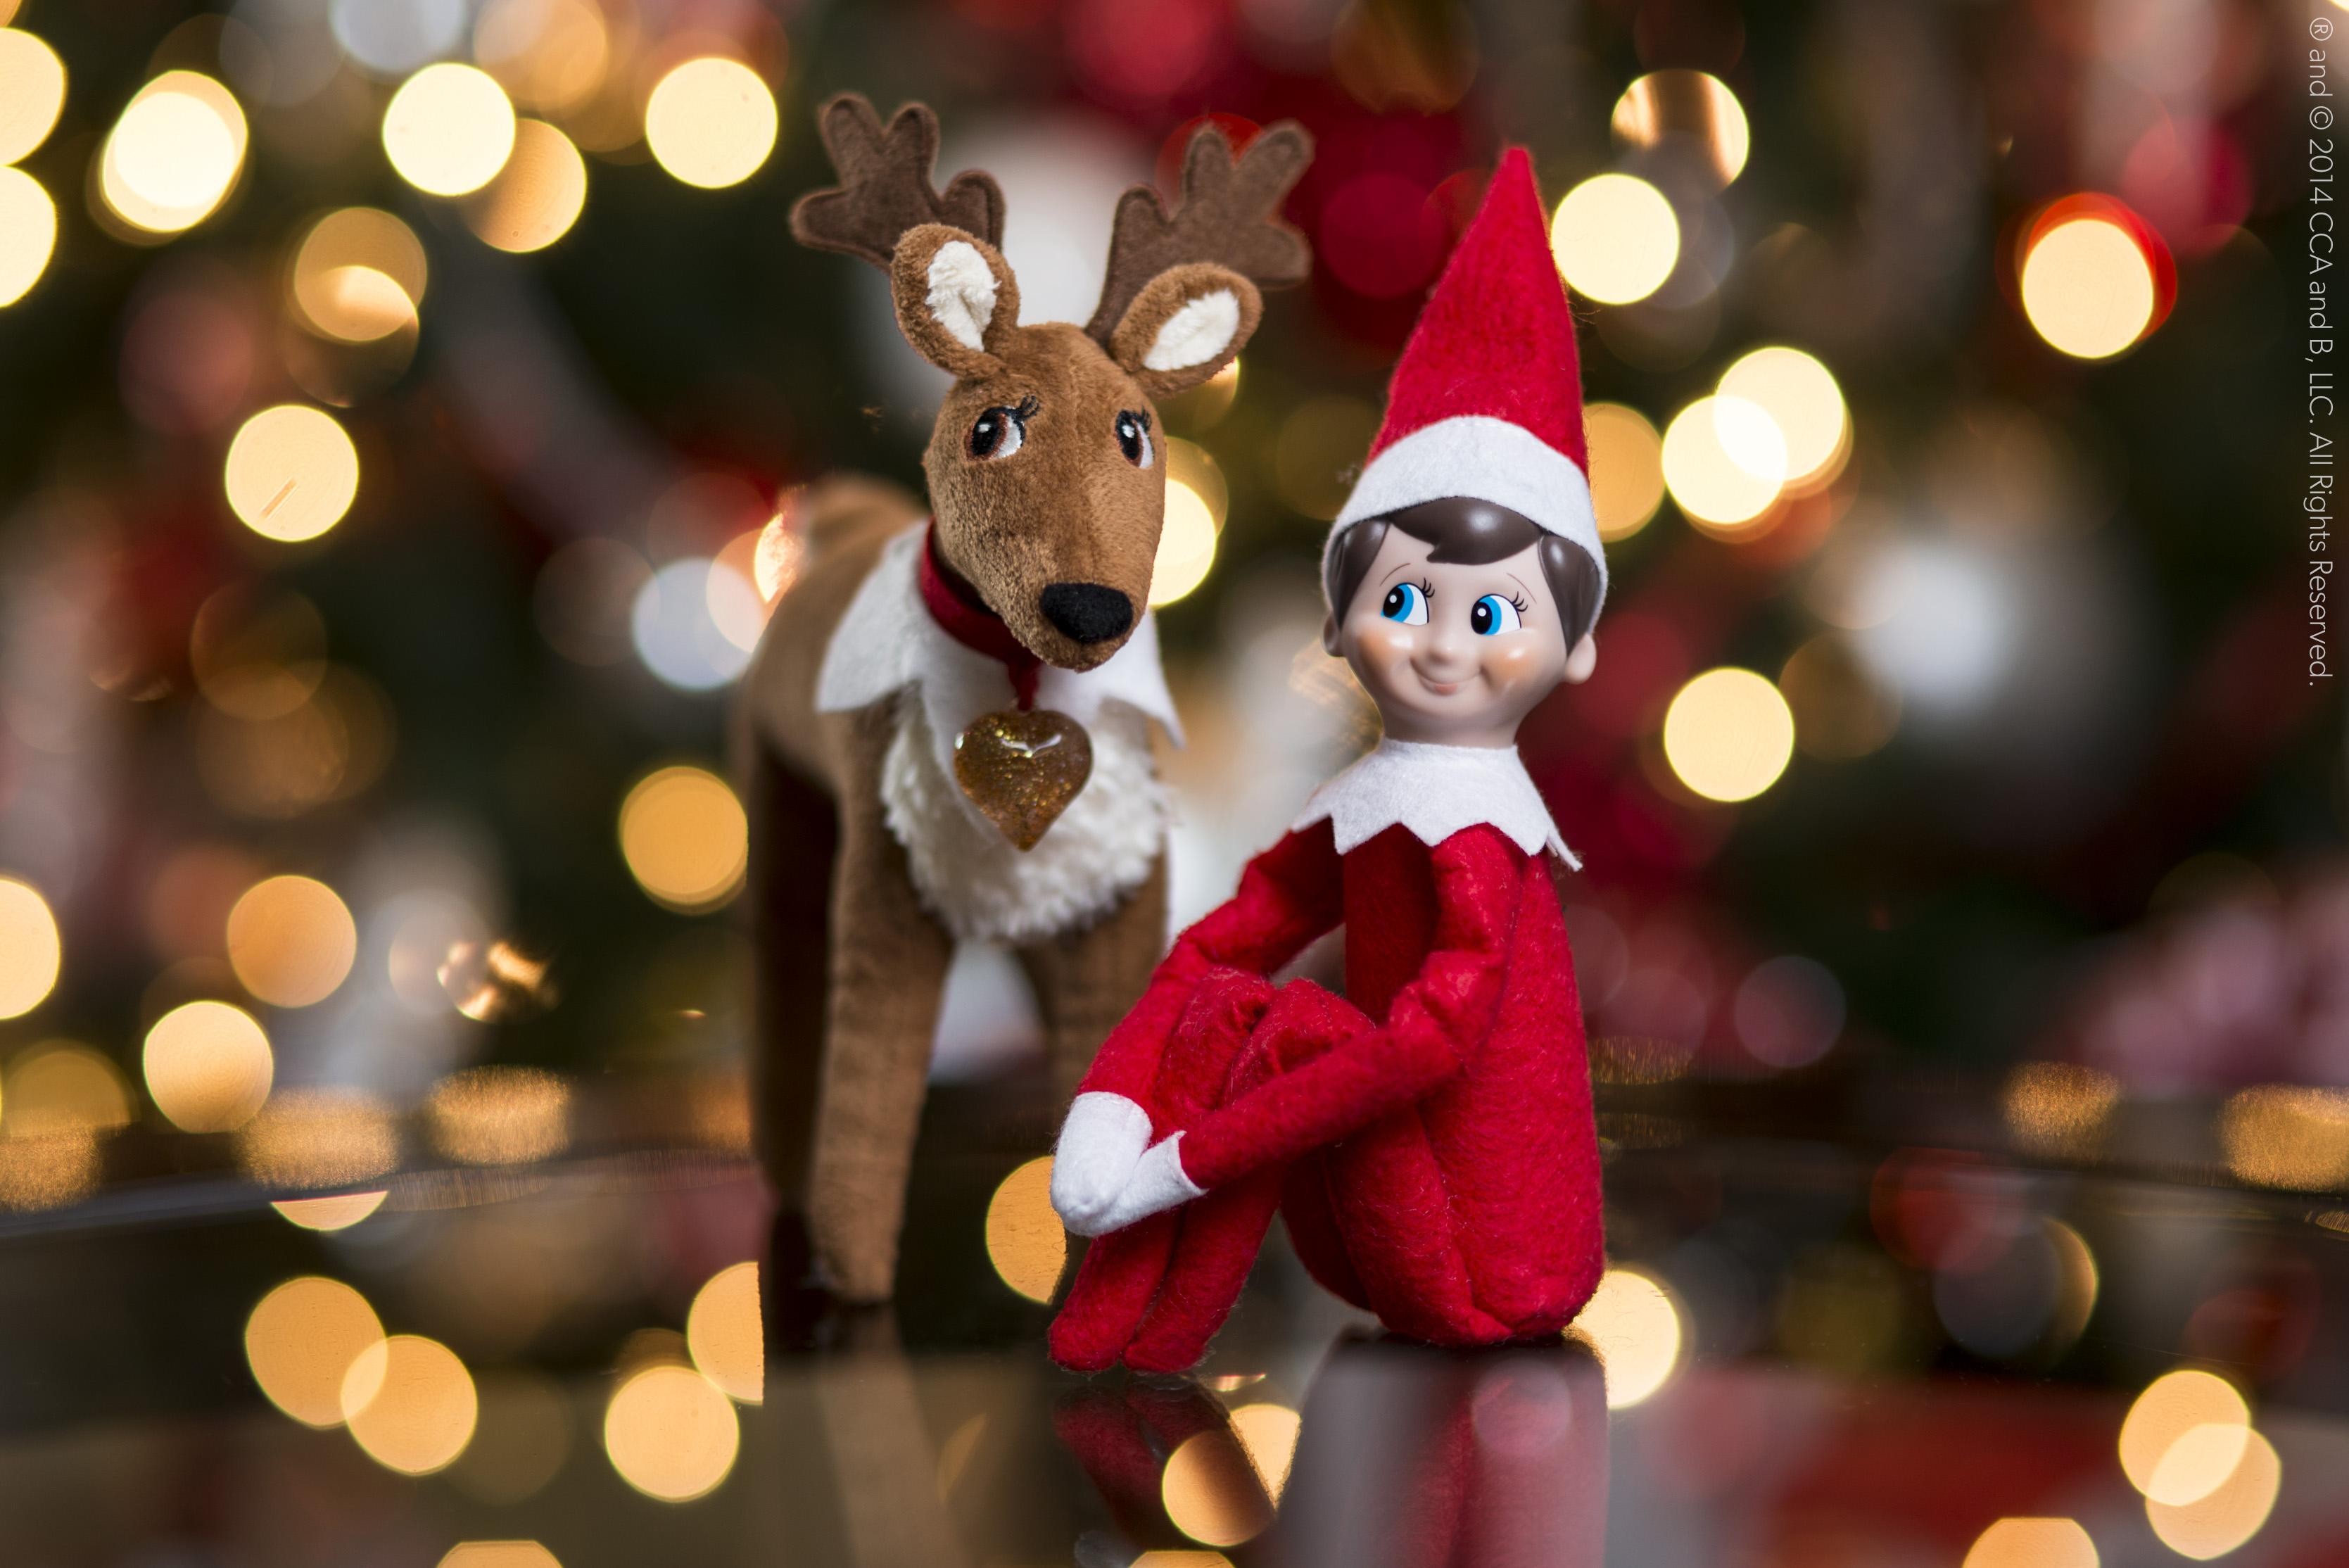 Reindeer_with_Scout_Elf_2